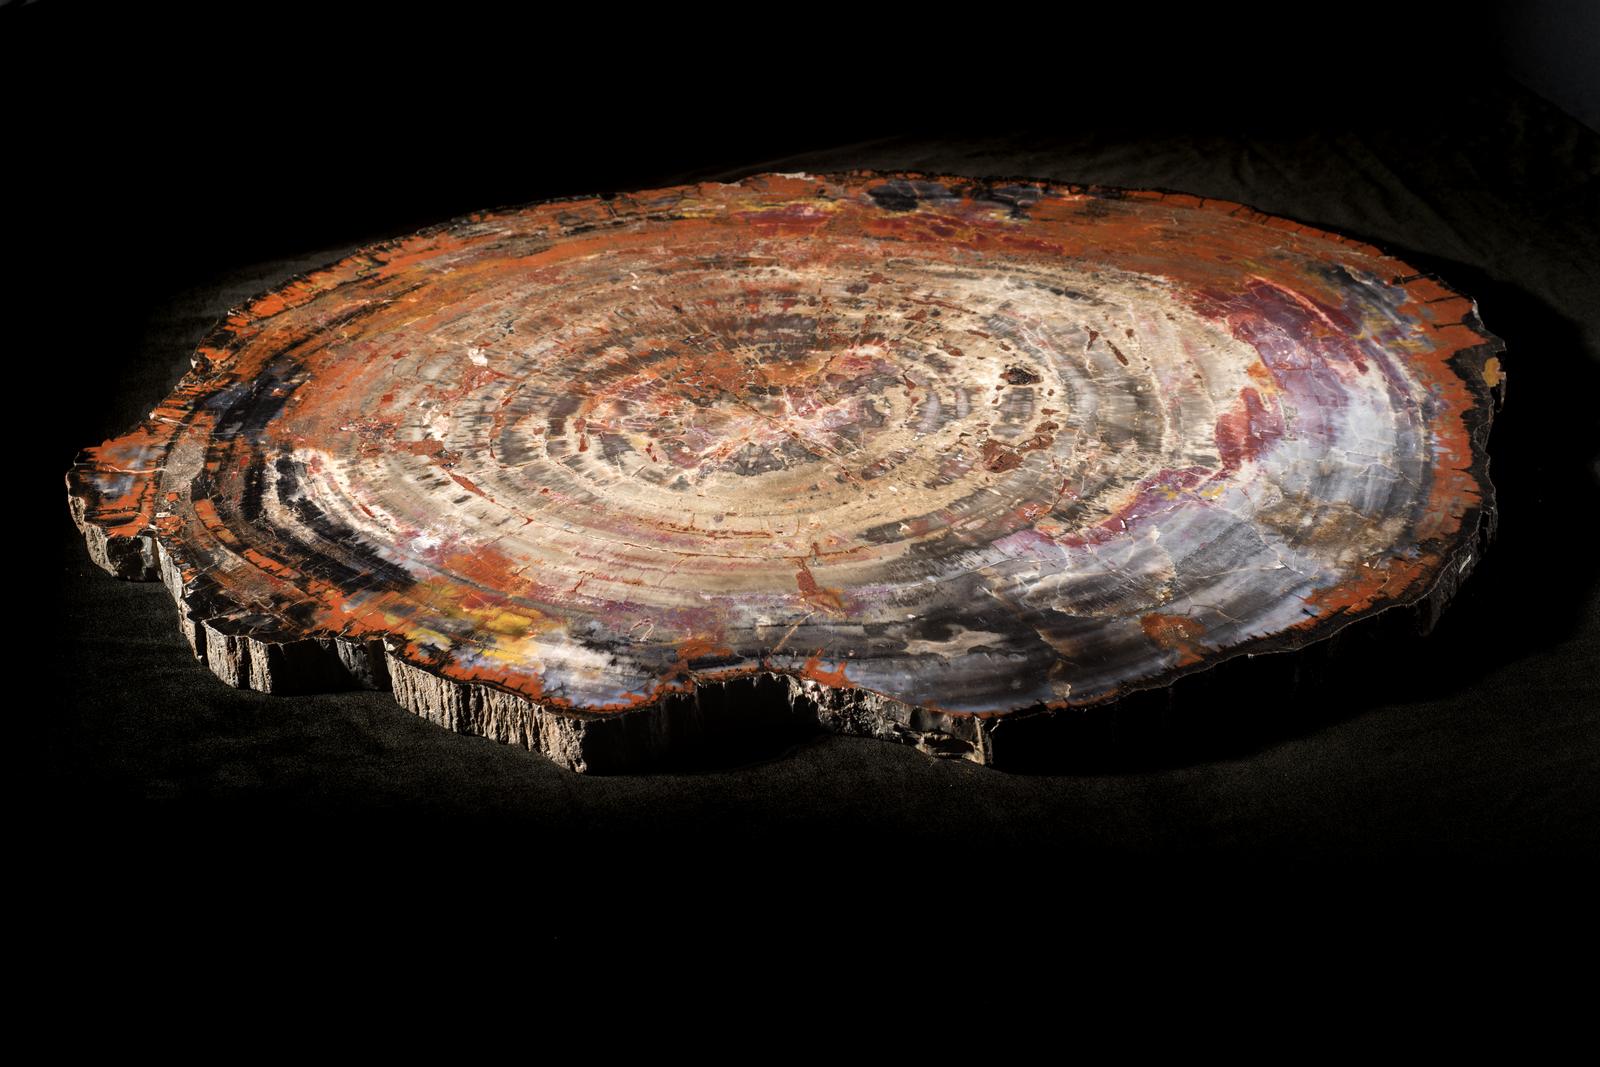 Jasperised wood from the Petrified Forest National Park, Arizona